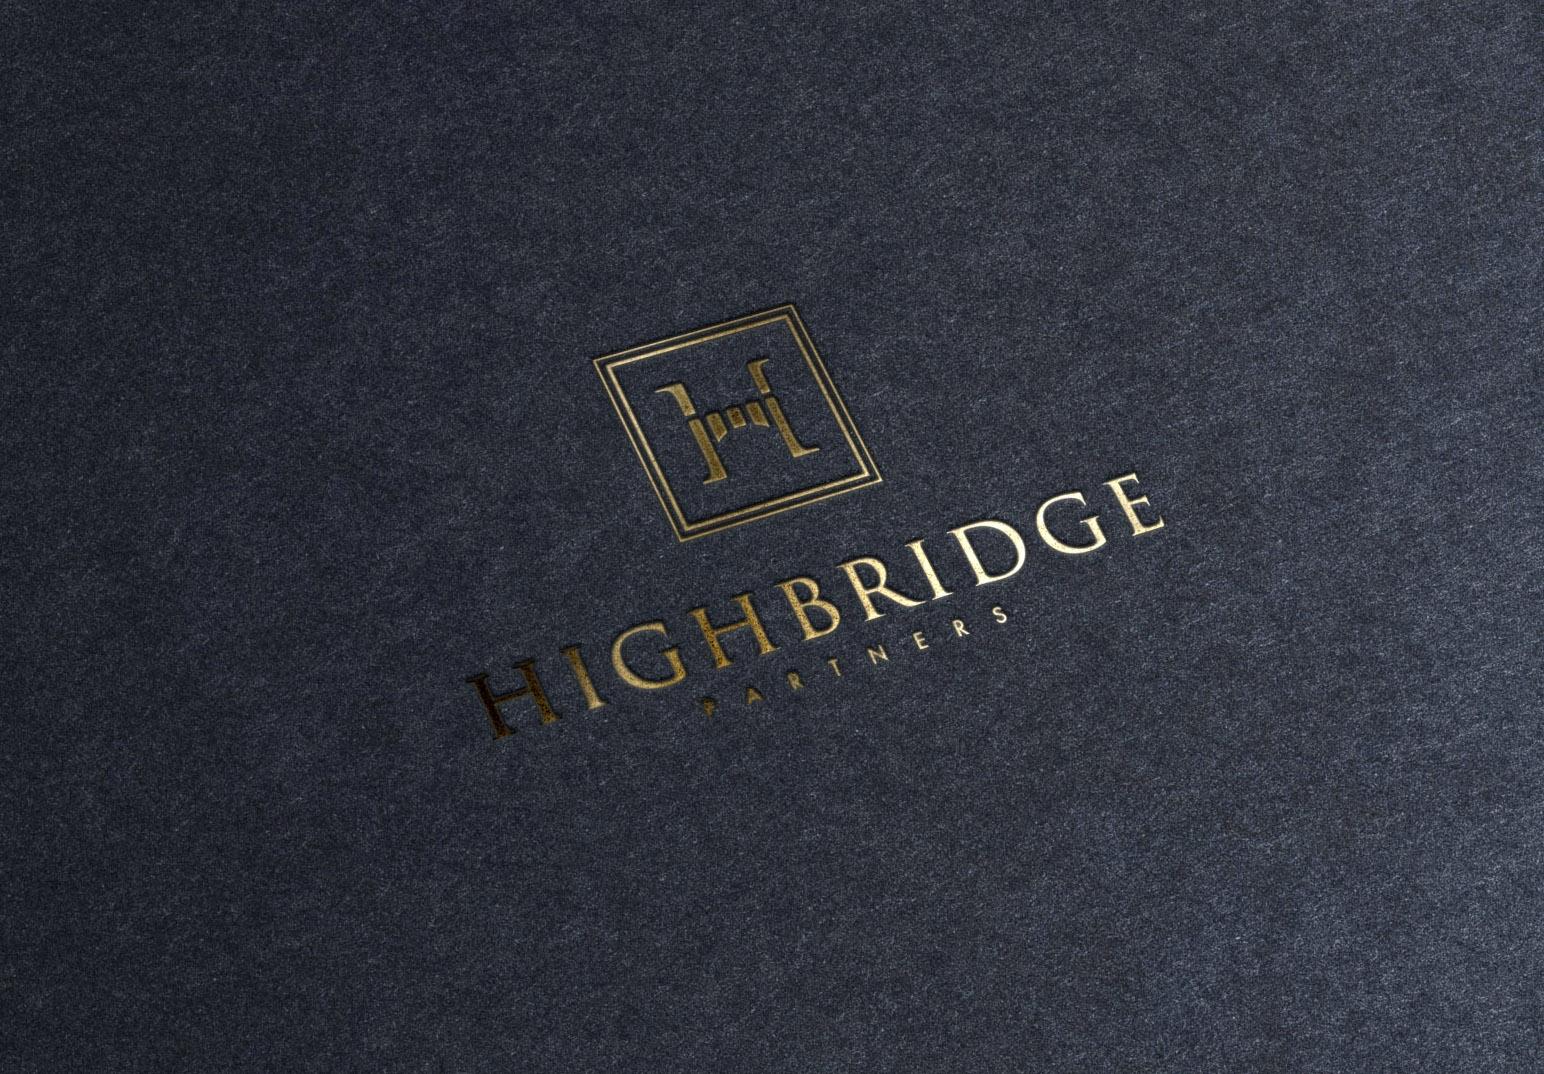 Highbridge Partners London Branding and Identity Design Project